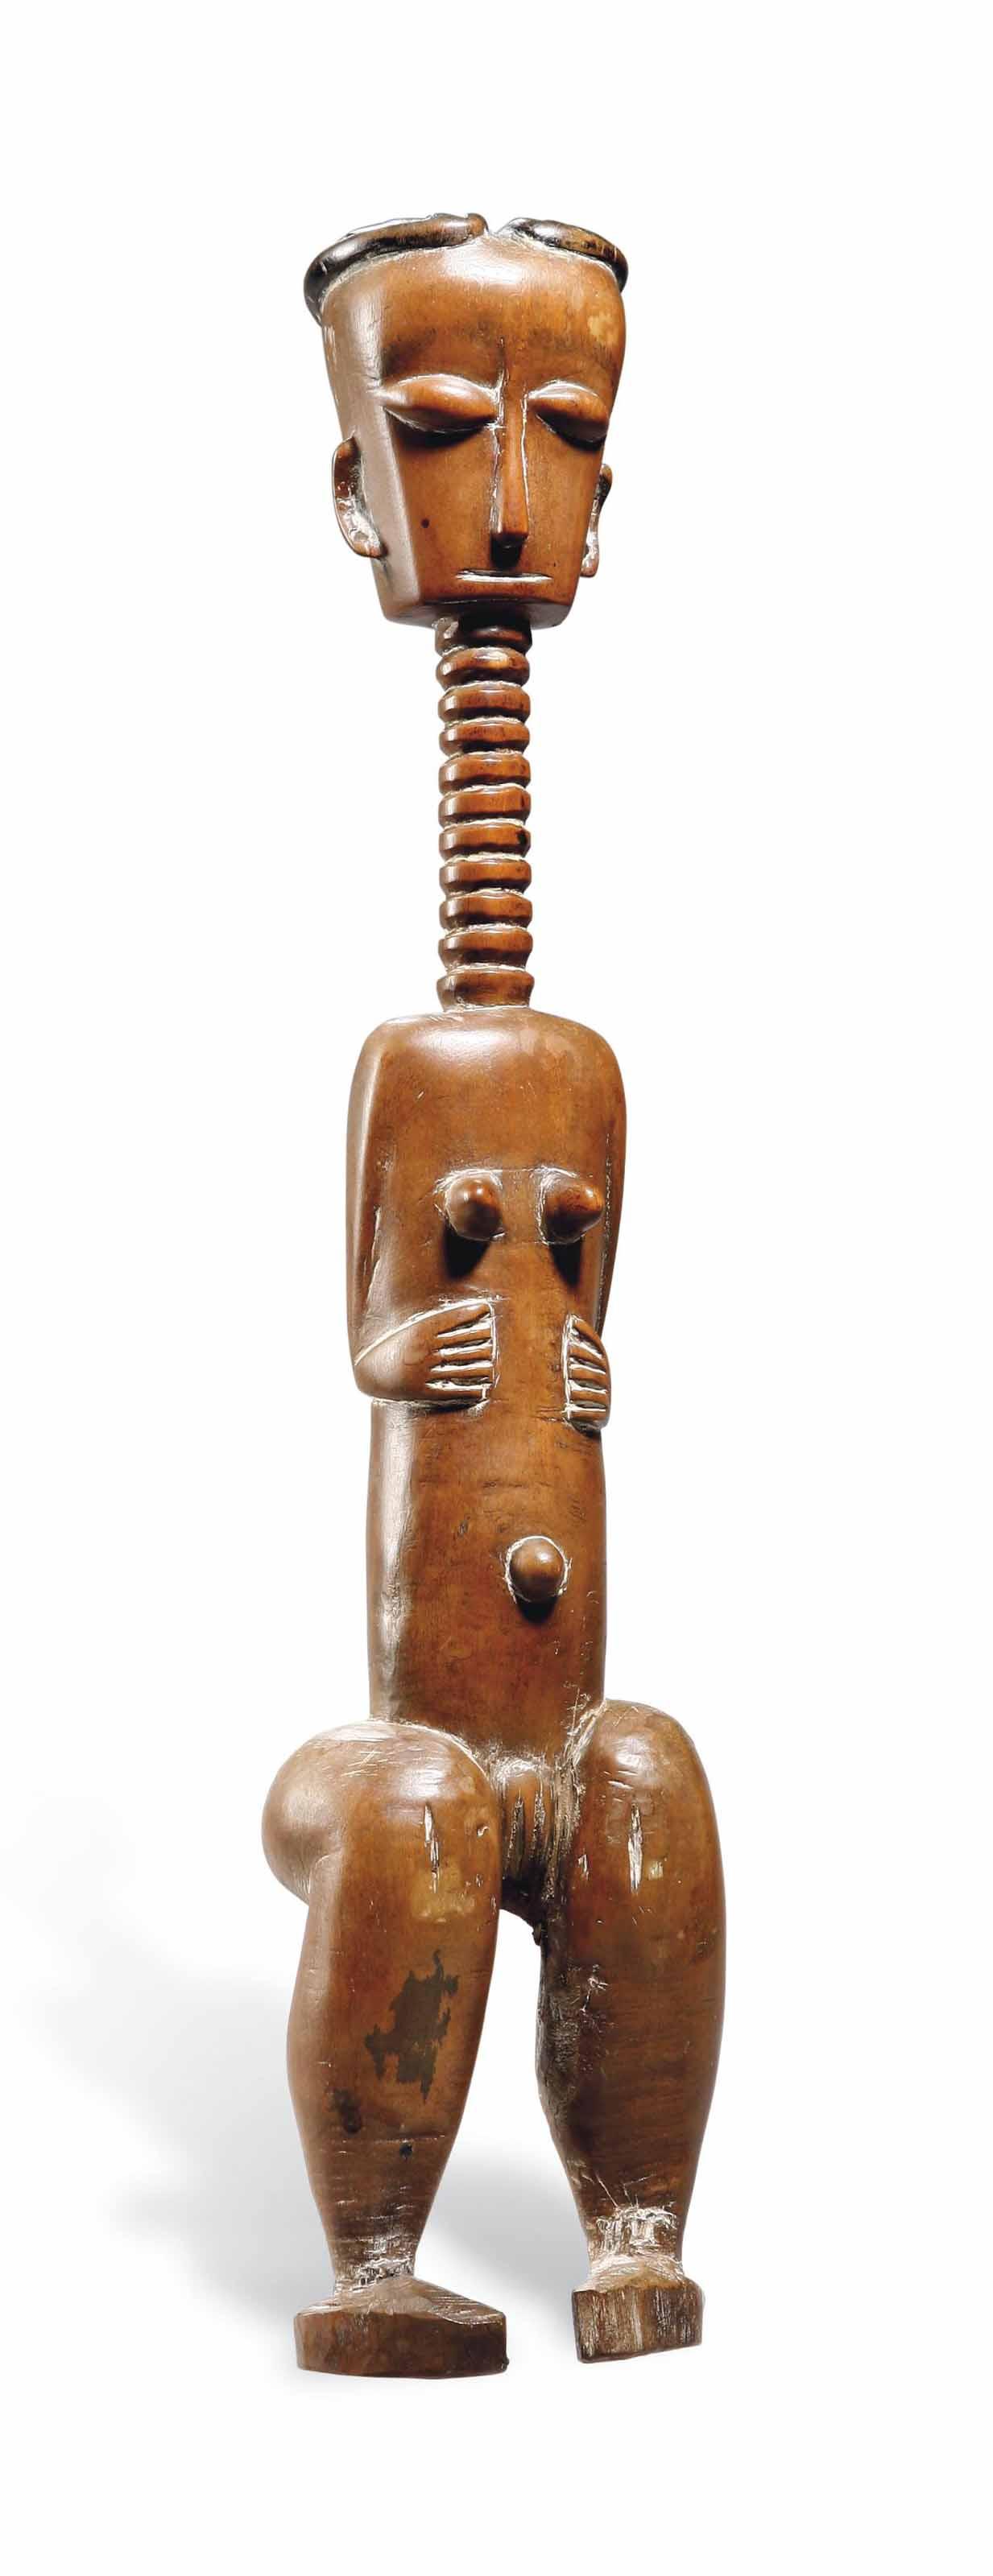 Statuette Fanti Fanti figure